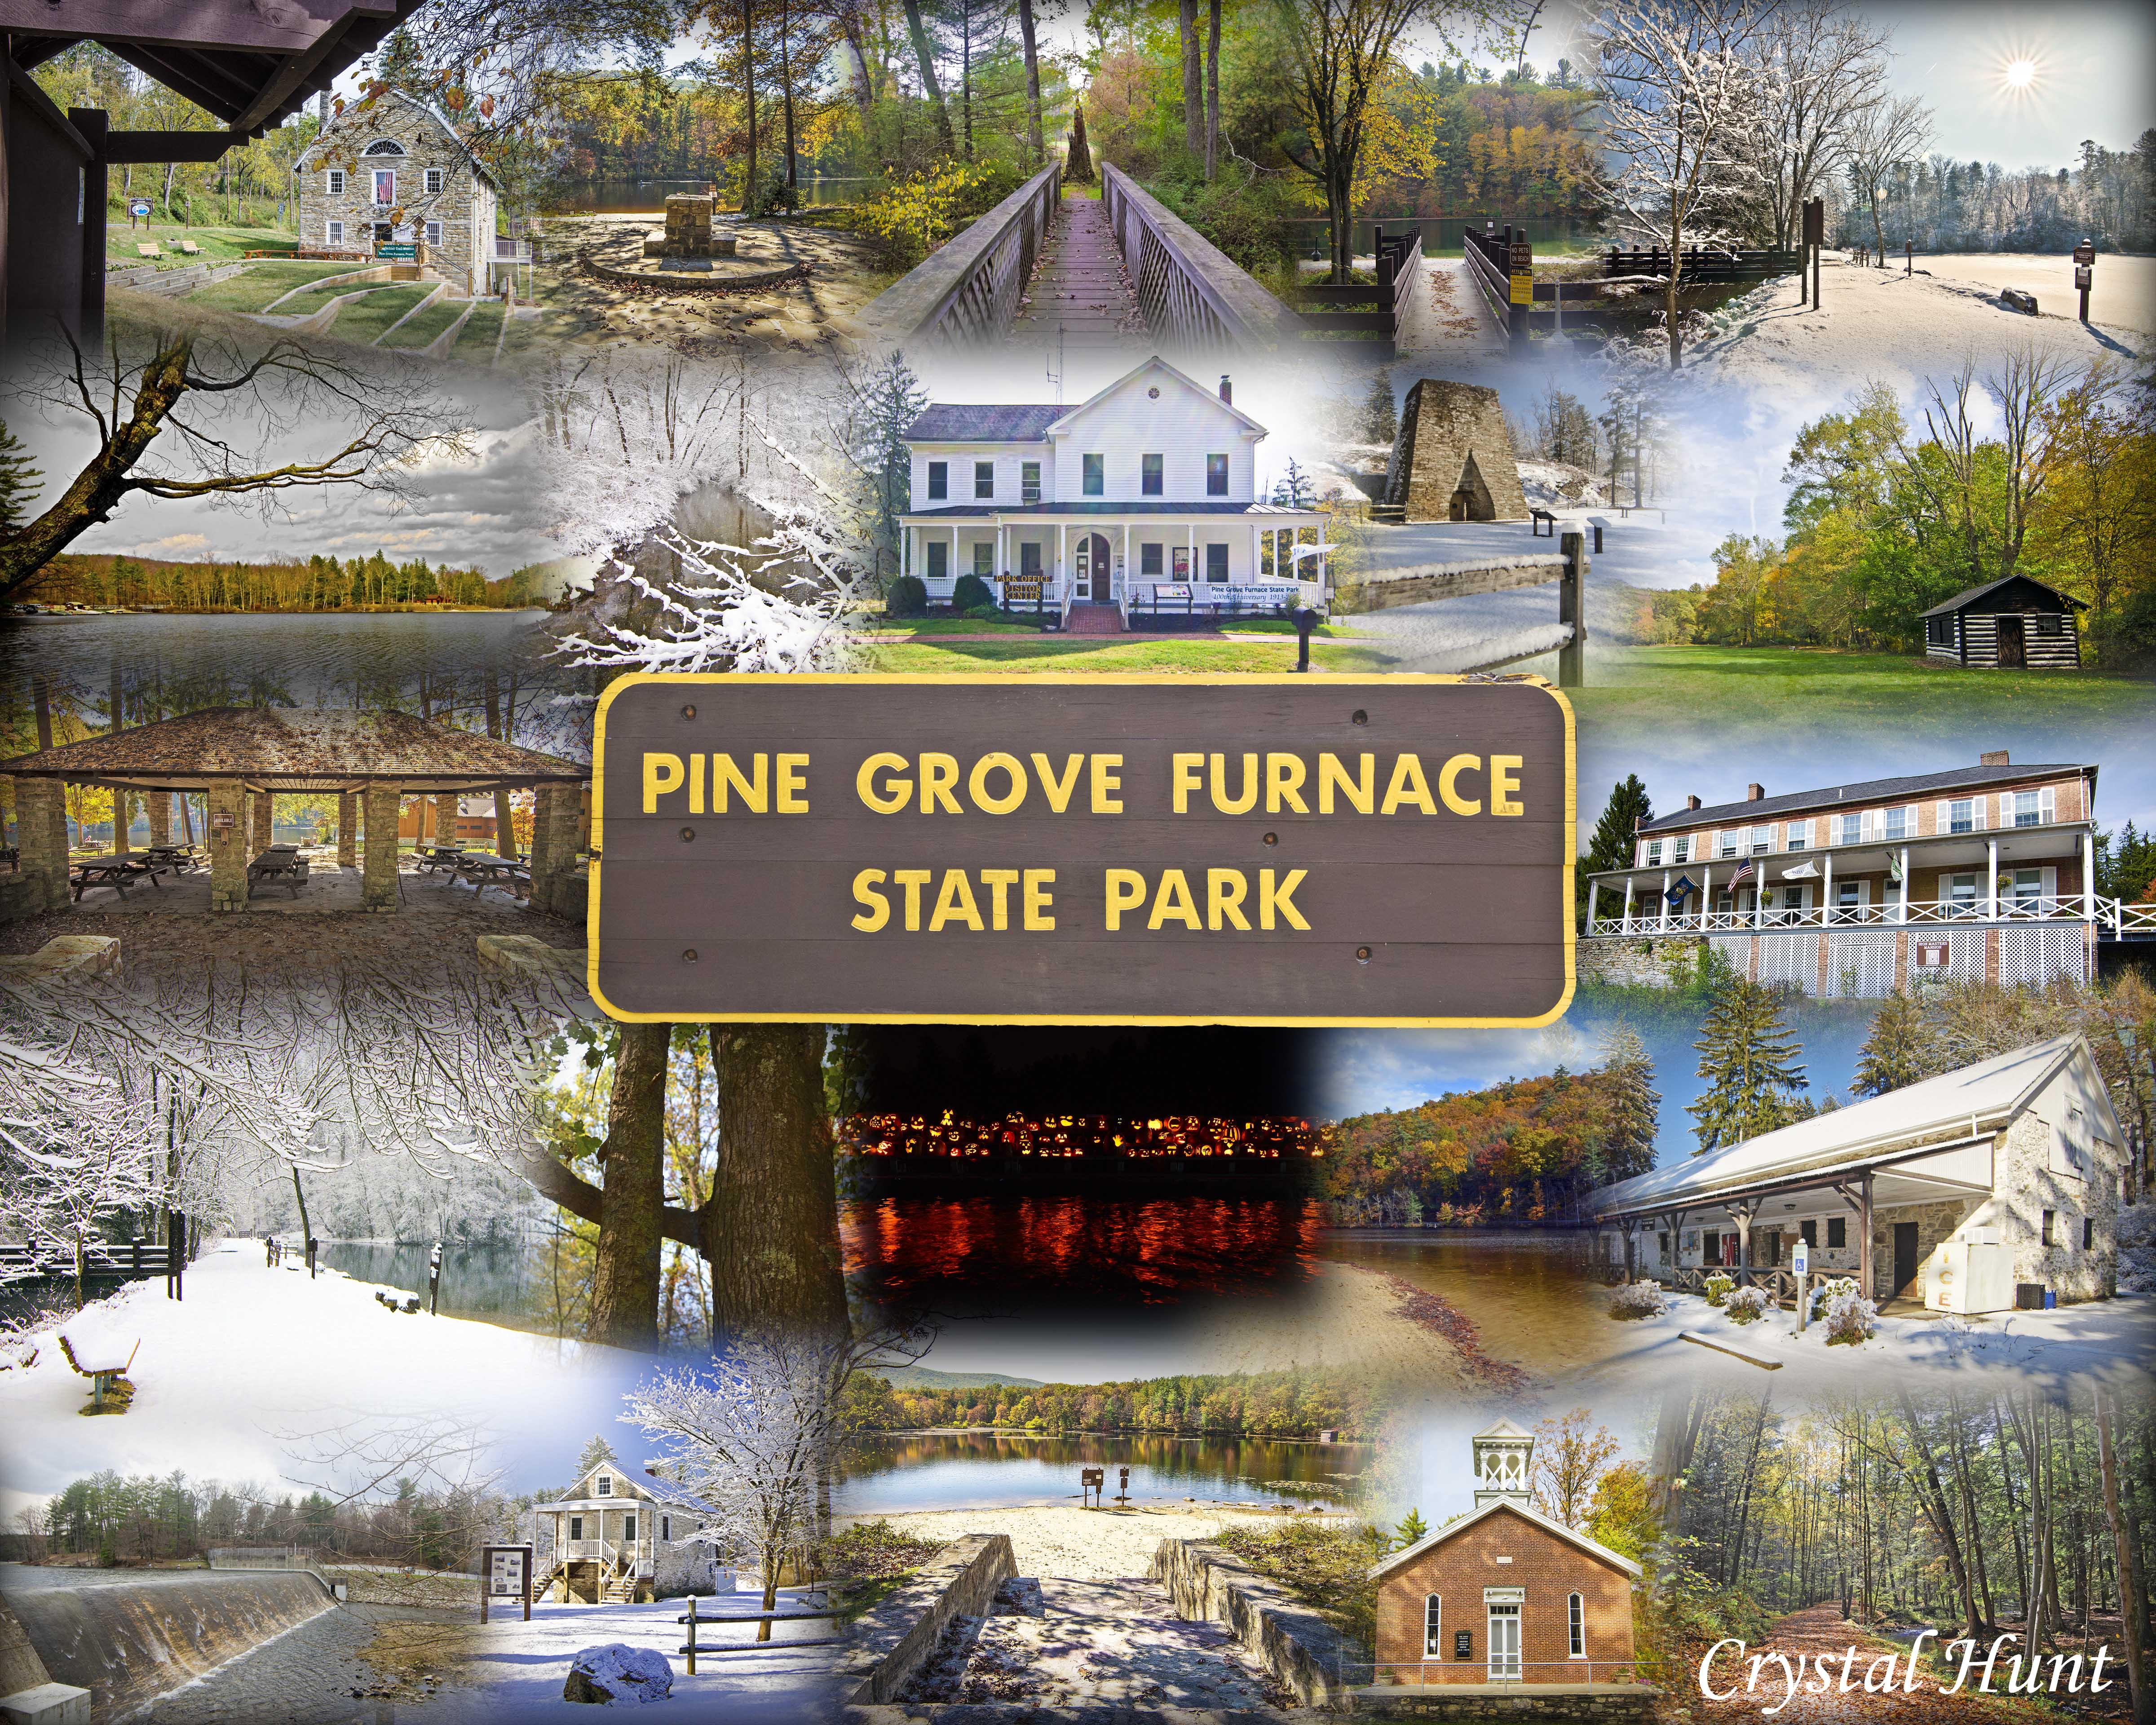 Pine Grove Furnace Montage